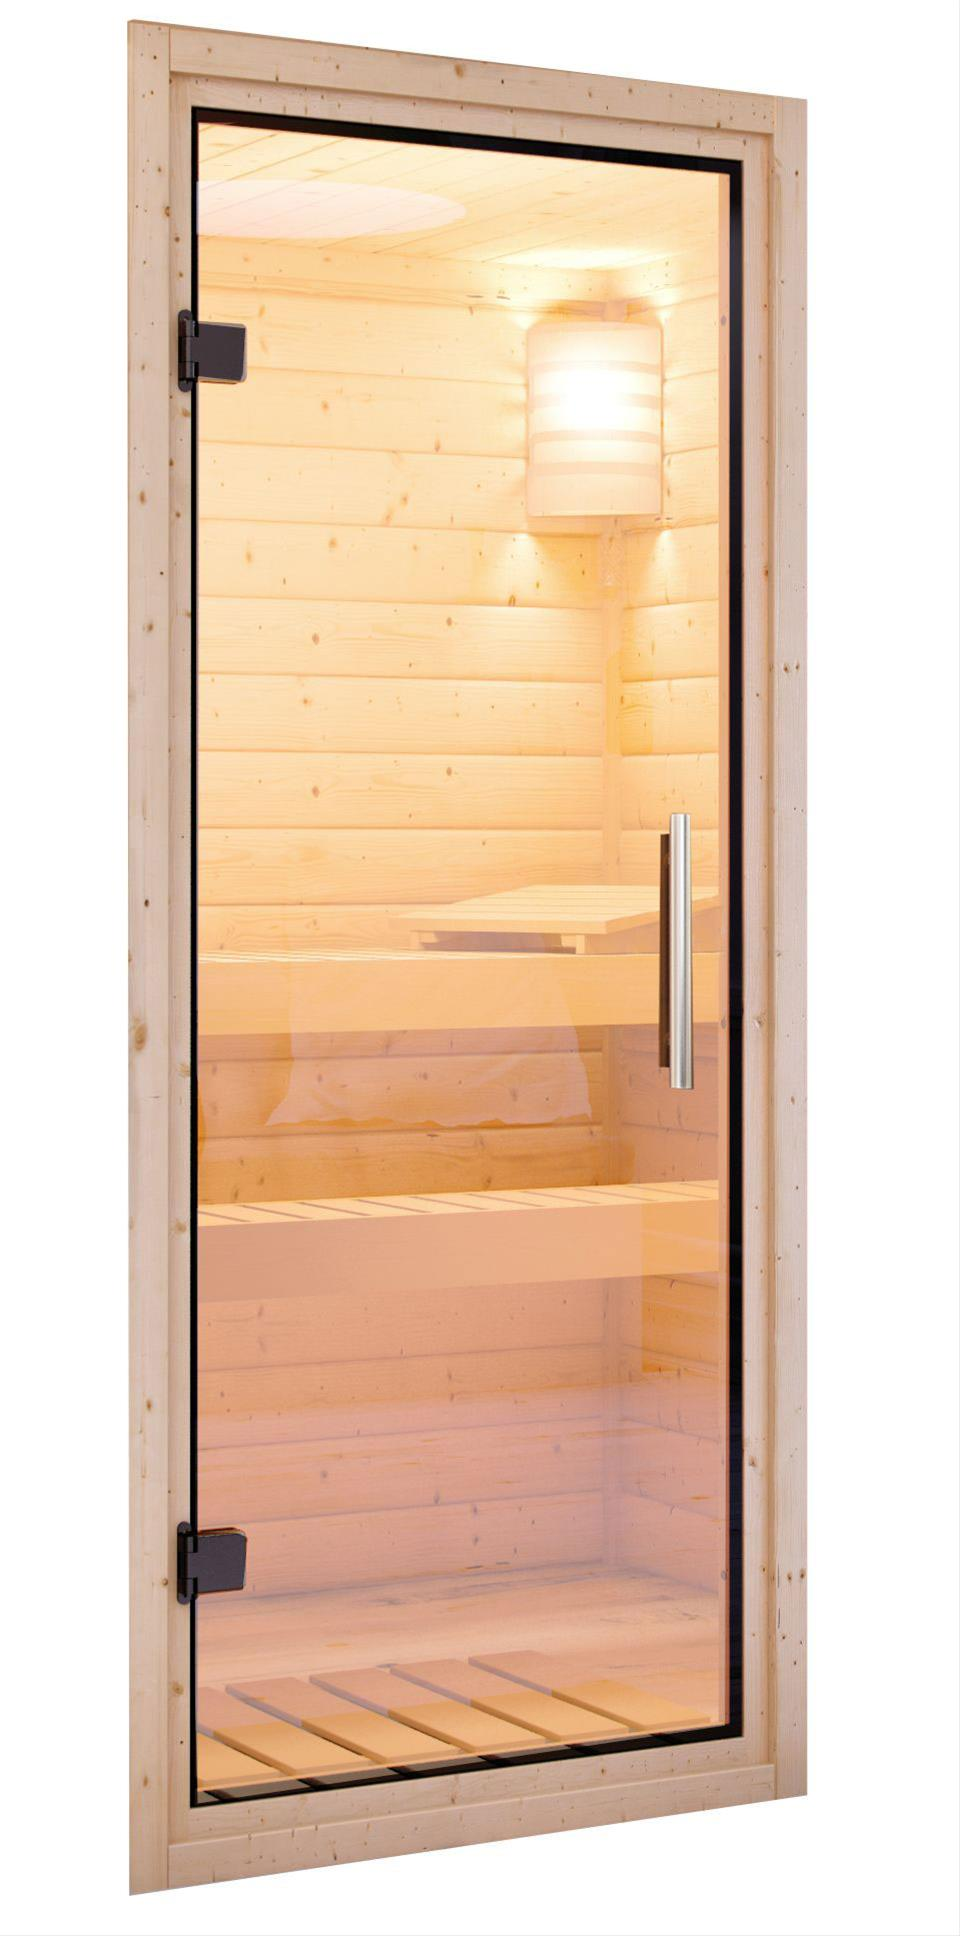 WoodFeeling Sauna Svea 38mm mit Bio Saunaofen 9 kW extern Klarglas Tür Bild 6